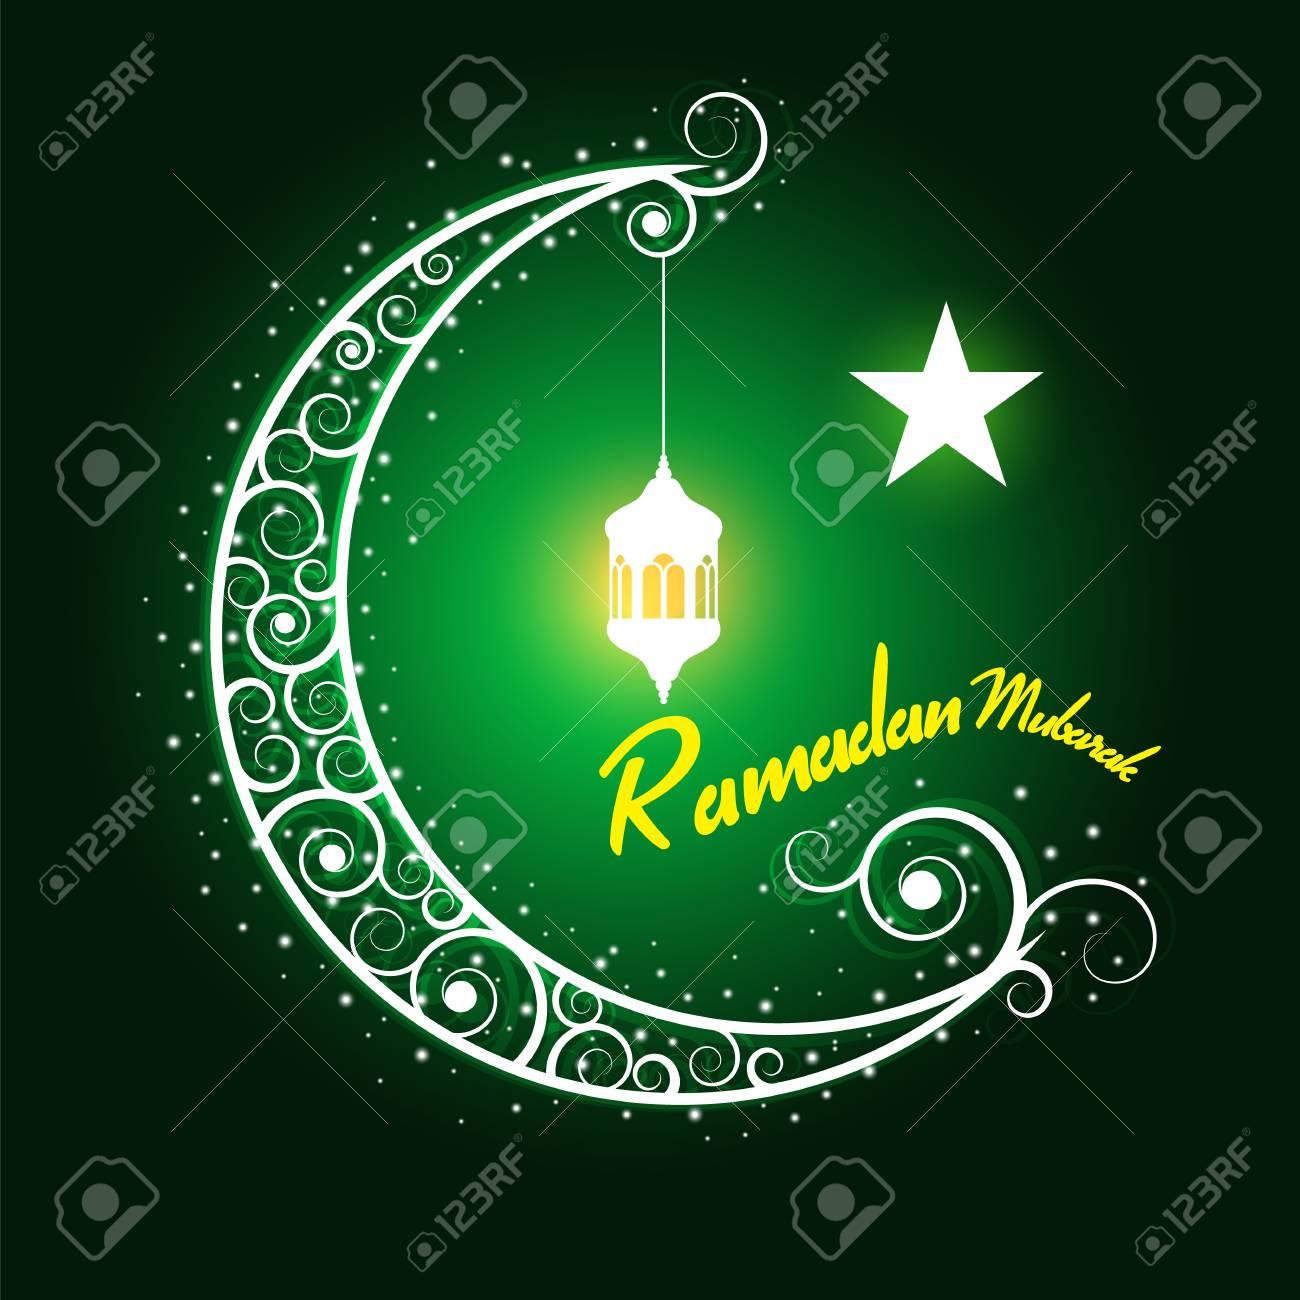 ramadan mubarak hanging lamps on moon and star on green background